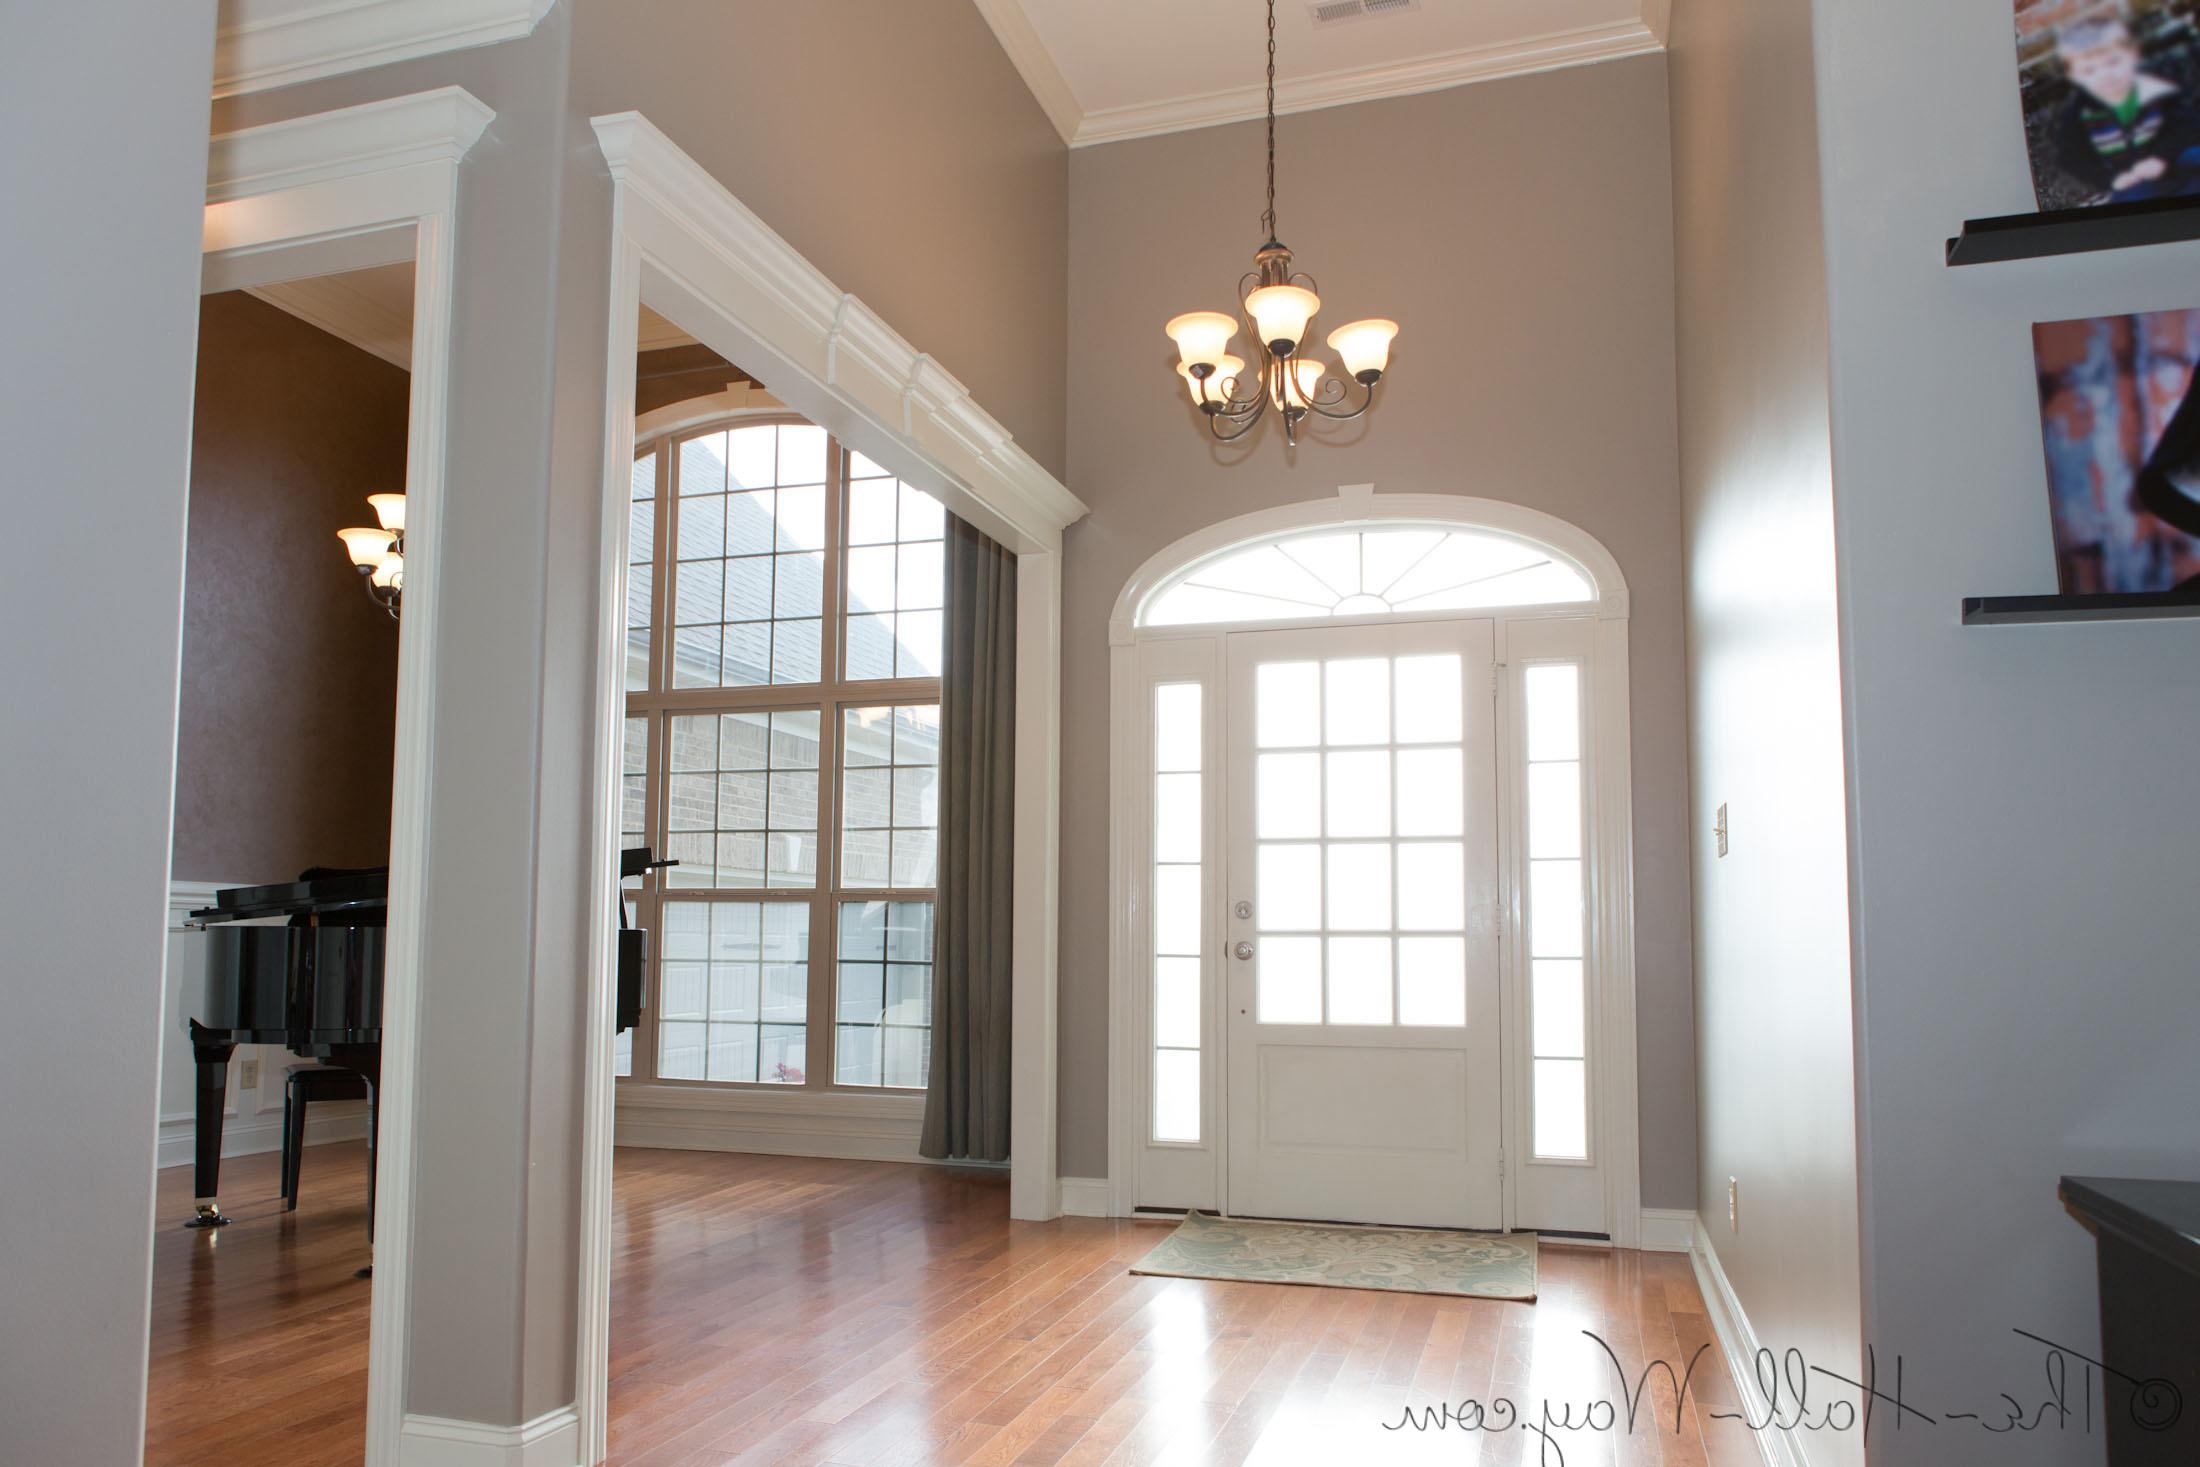 Newest Interior Design: Mesmerizing Valspar Brushed Pearl Design For Chic For Brushed Pearl Over The Door Wall Decor (View 20 of 20)